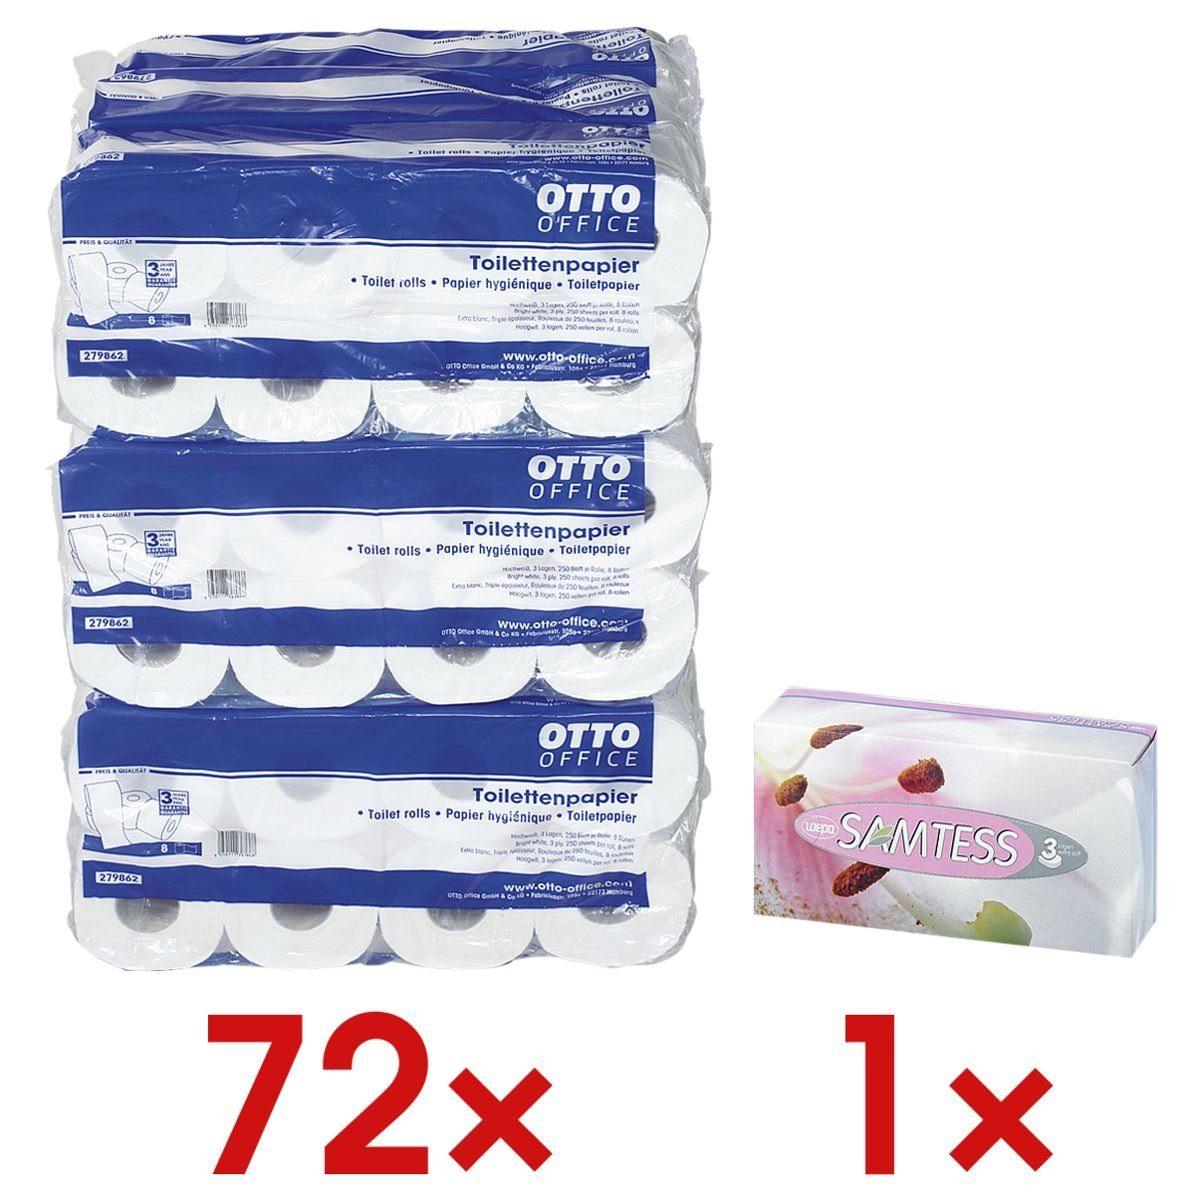 OTTOOFFICE STANDARD Toilettenpapier 3-lagig - 72 Rollen inkl. Kosmetiktücher 1 Set